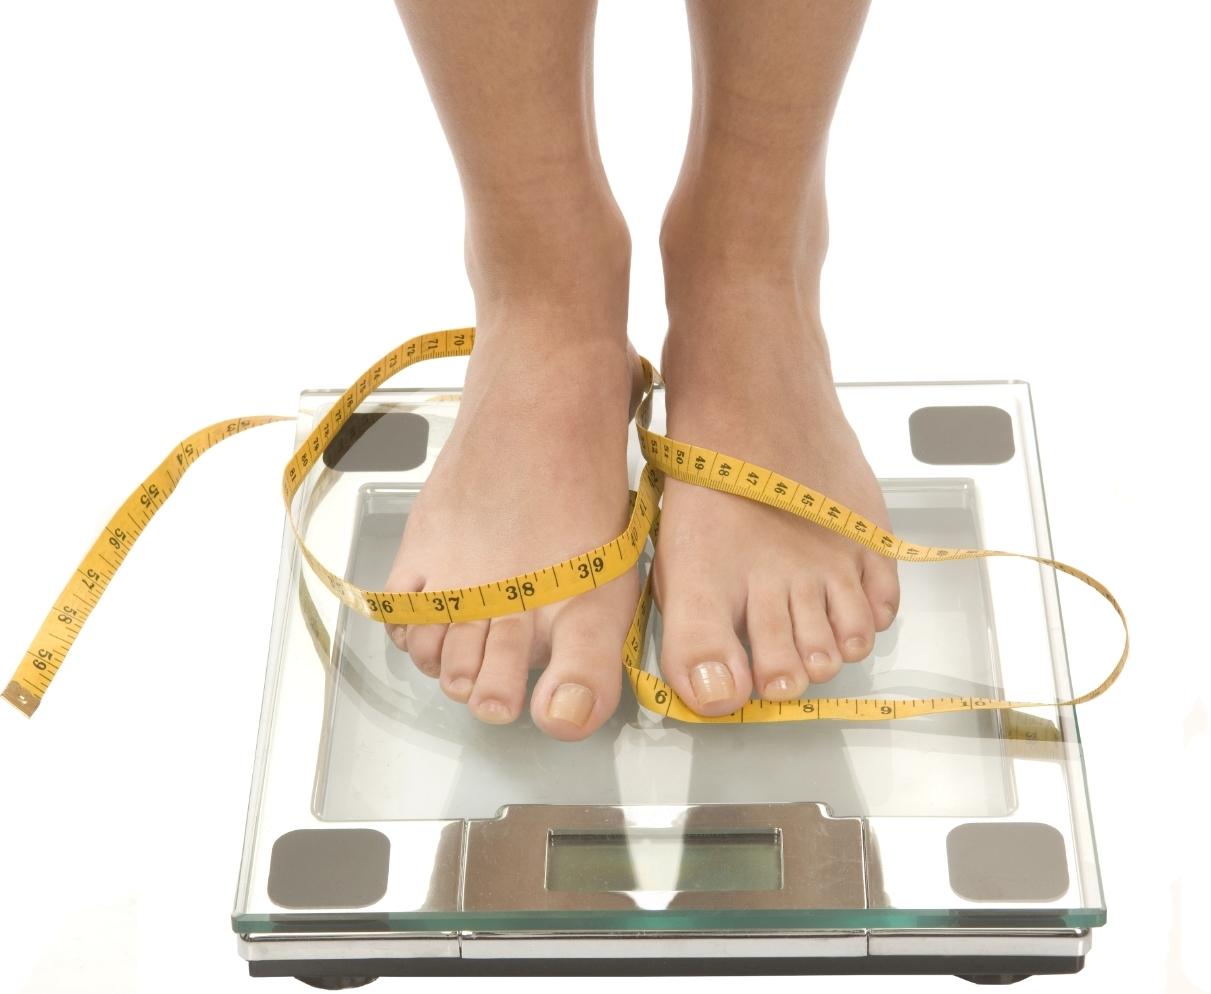 24 trucos para perder peso rapido